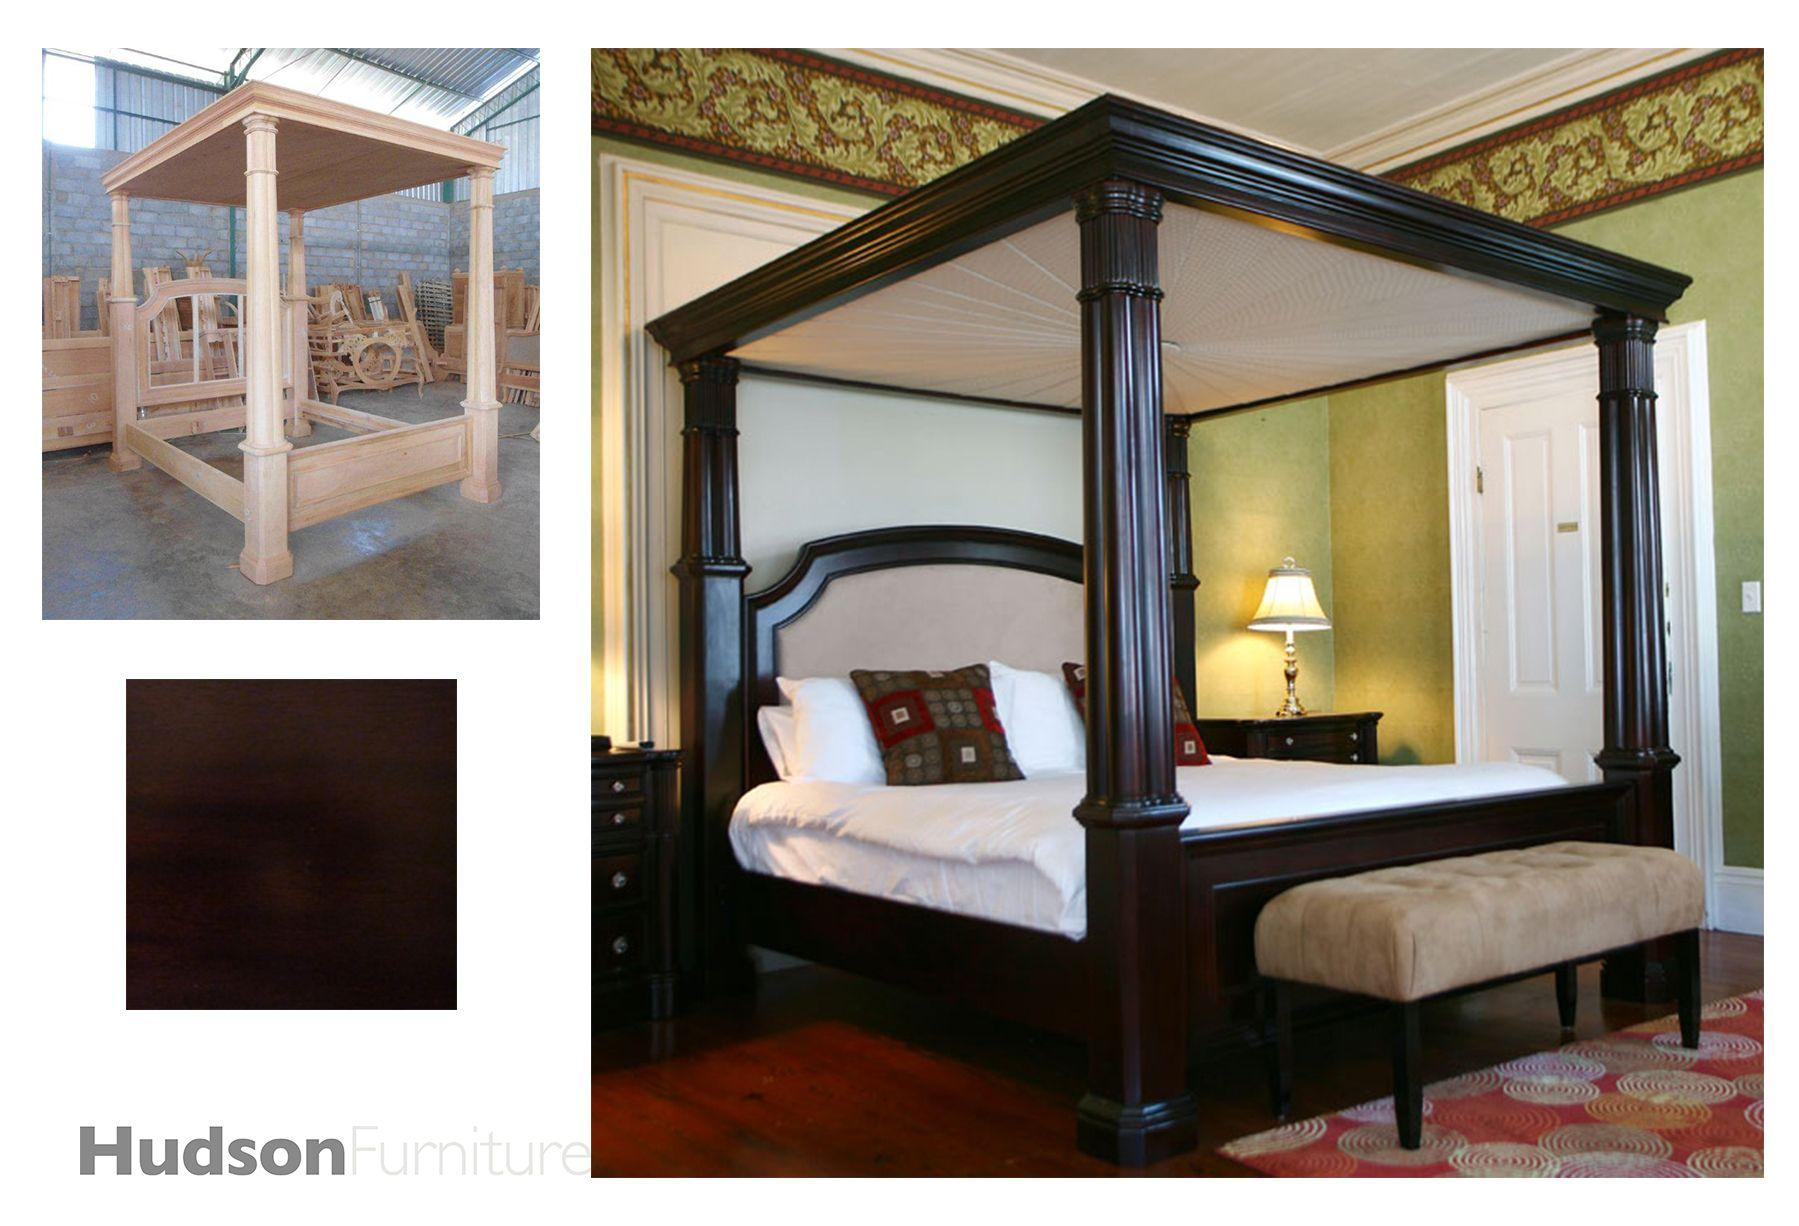 4 Poster Bed Four Poster Bed 4 Poster Beds 4 Poster Bed Canopy